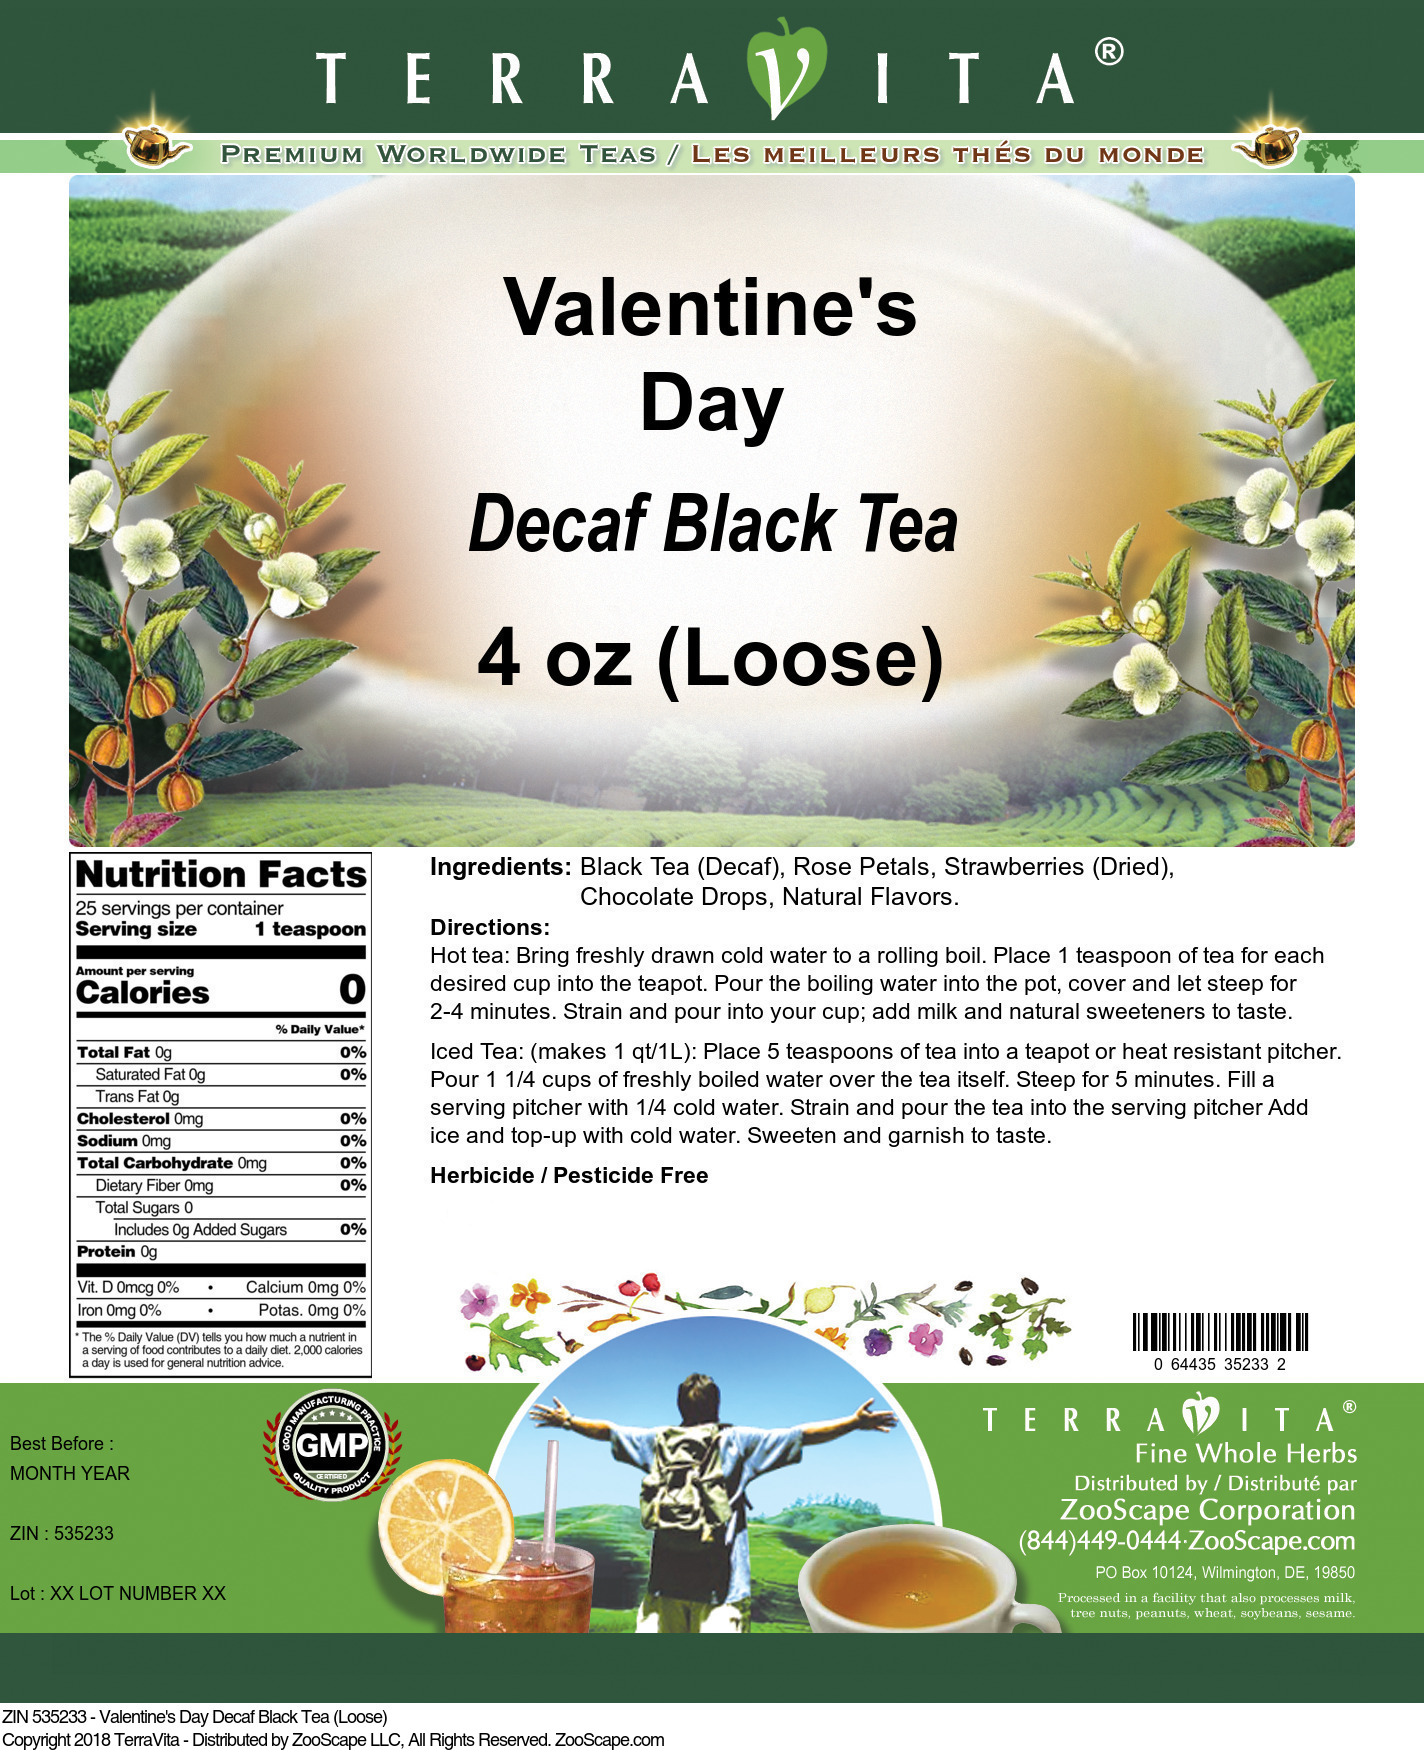 Valentine's Day Decaf Black Tea (Loose)